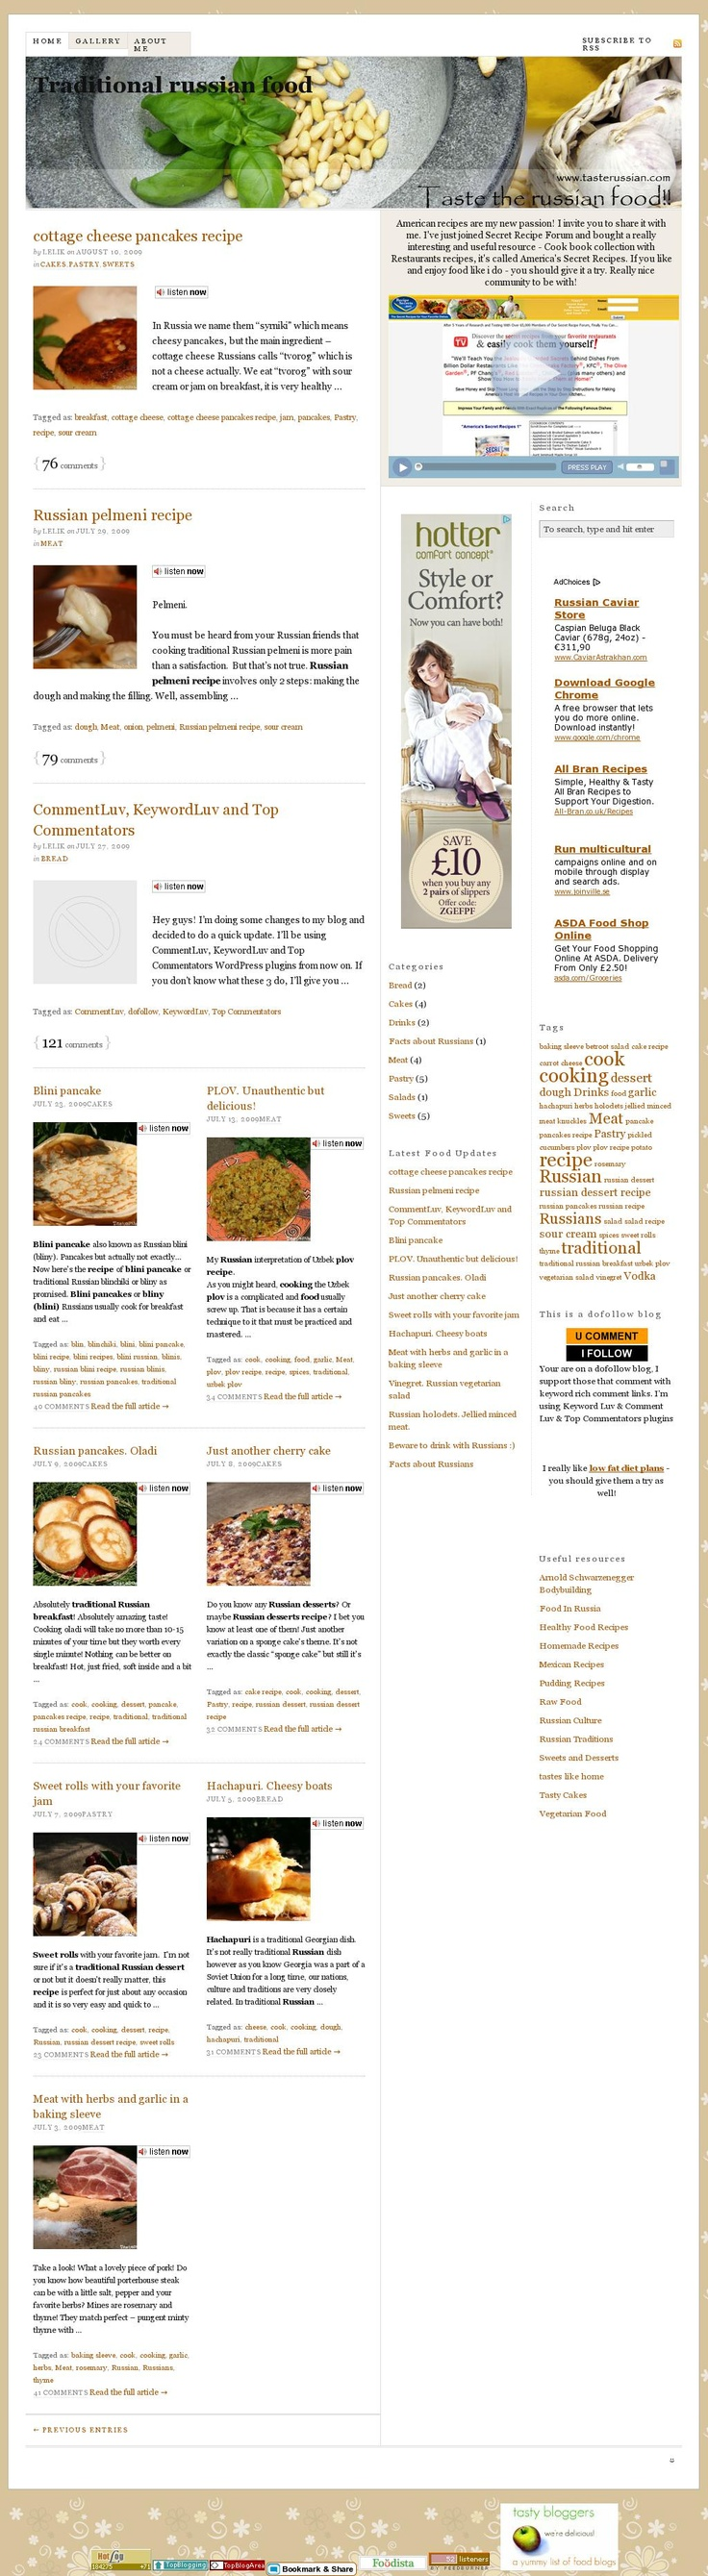 Taste Russian - Traditional Russian Food  The website 'http://tasterussian.com/' courtesy of @Pinstamatic (http://pinstamatic.com)